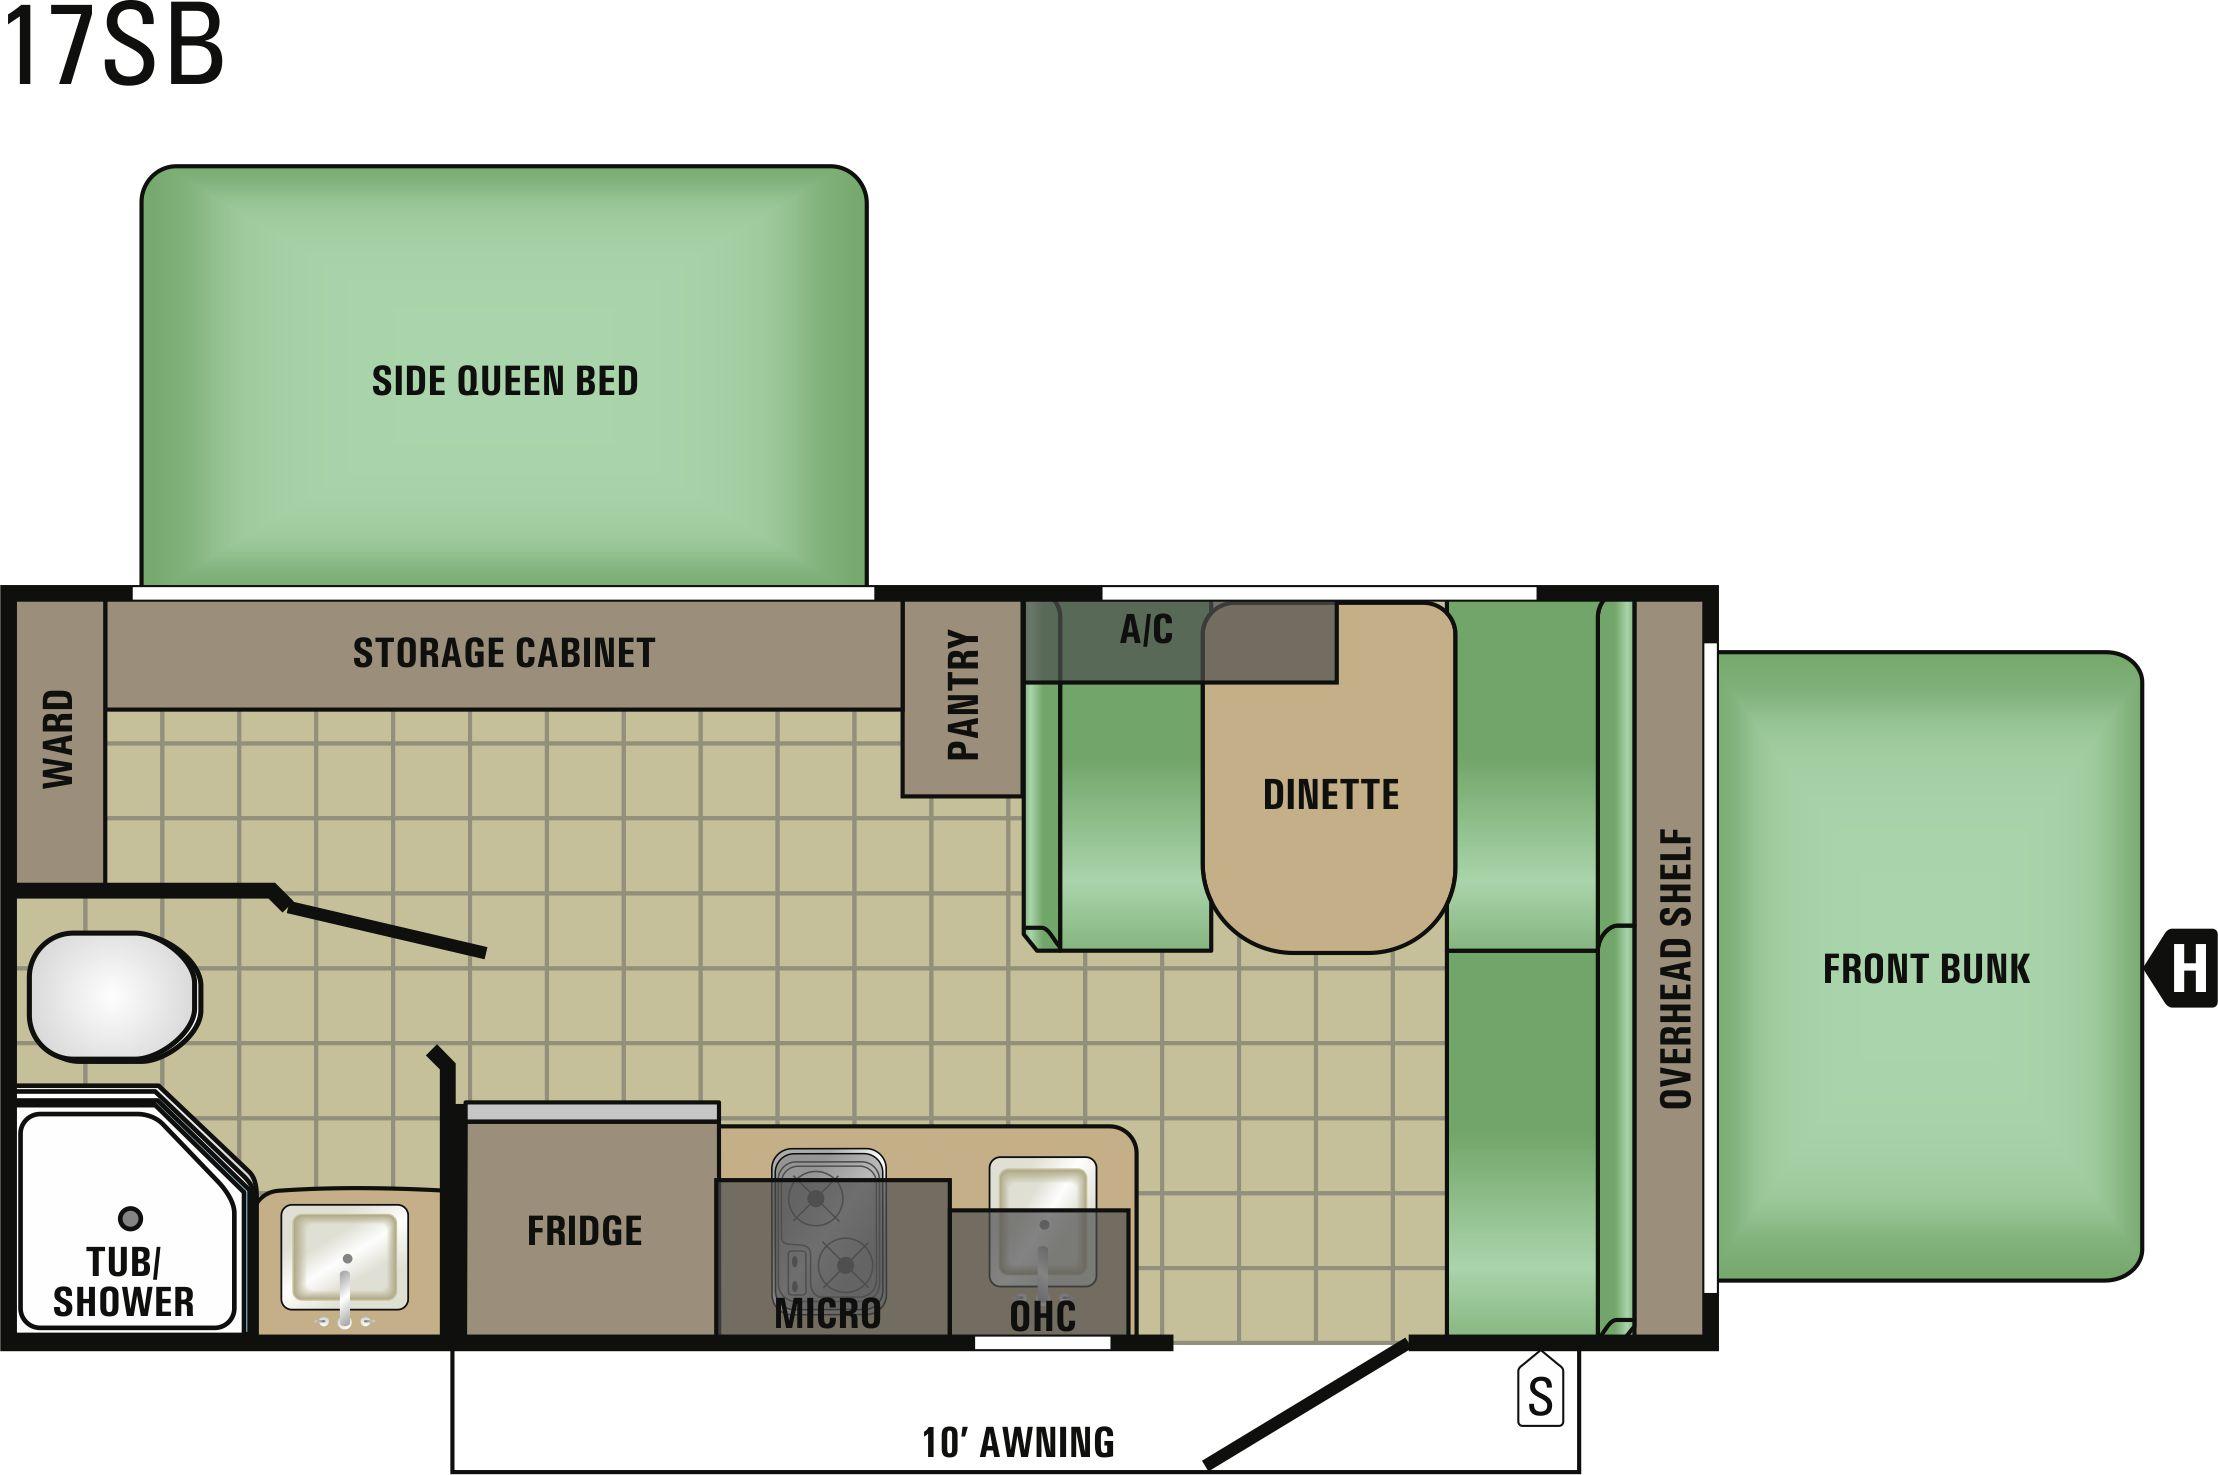 17SB Floorplan